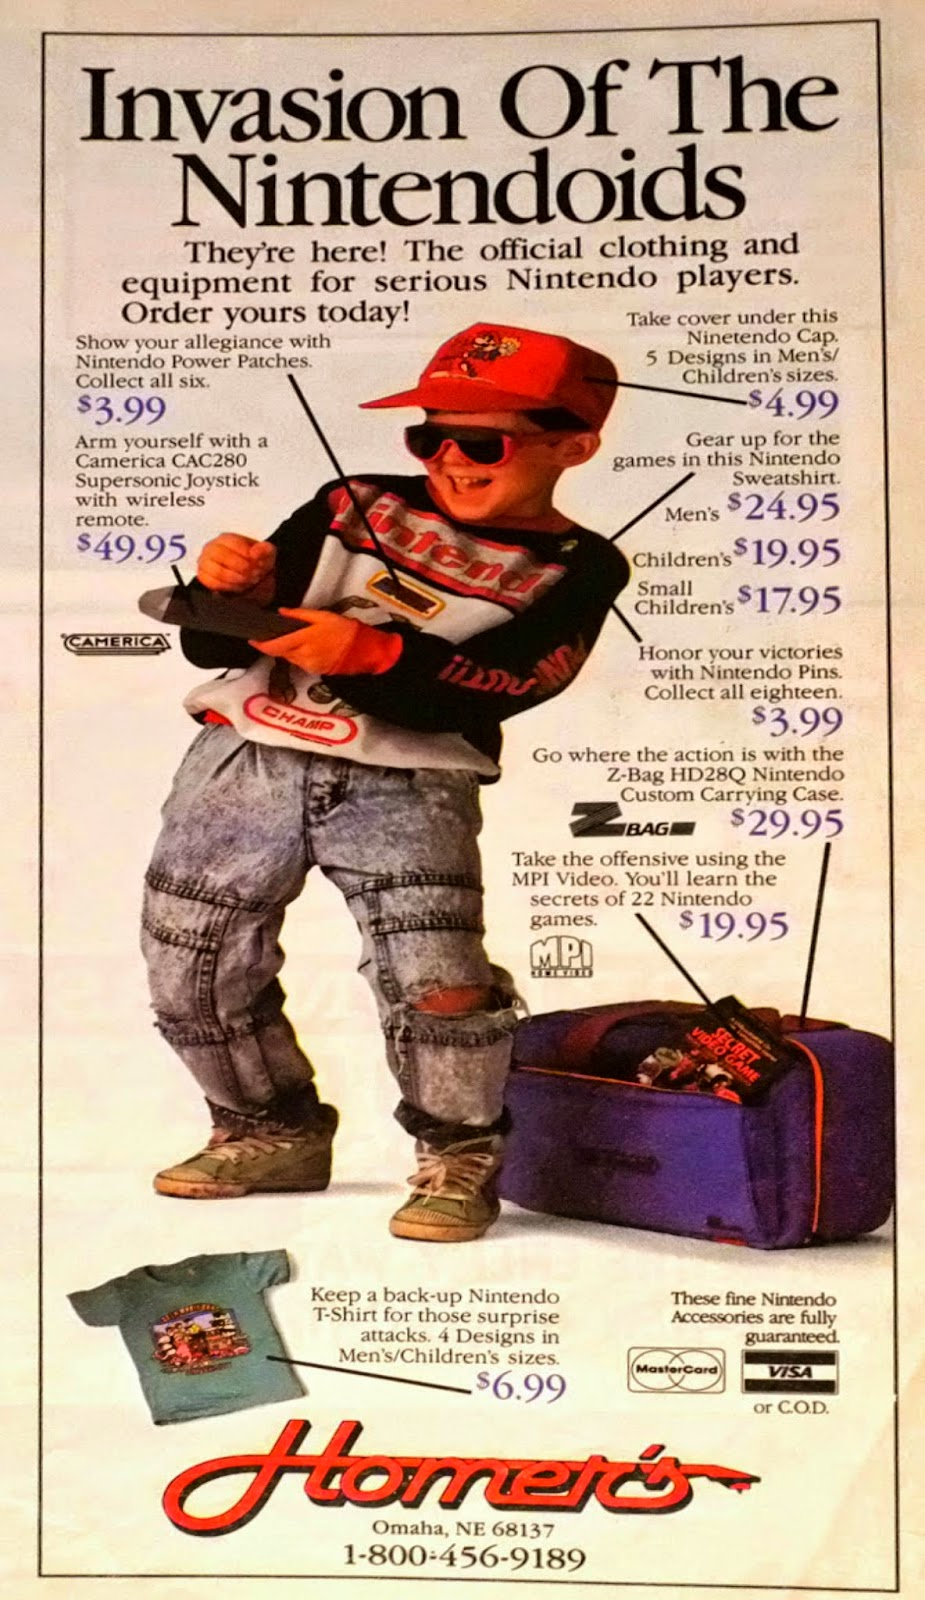 Homer's Nintendo Gear & Clothing advertisement